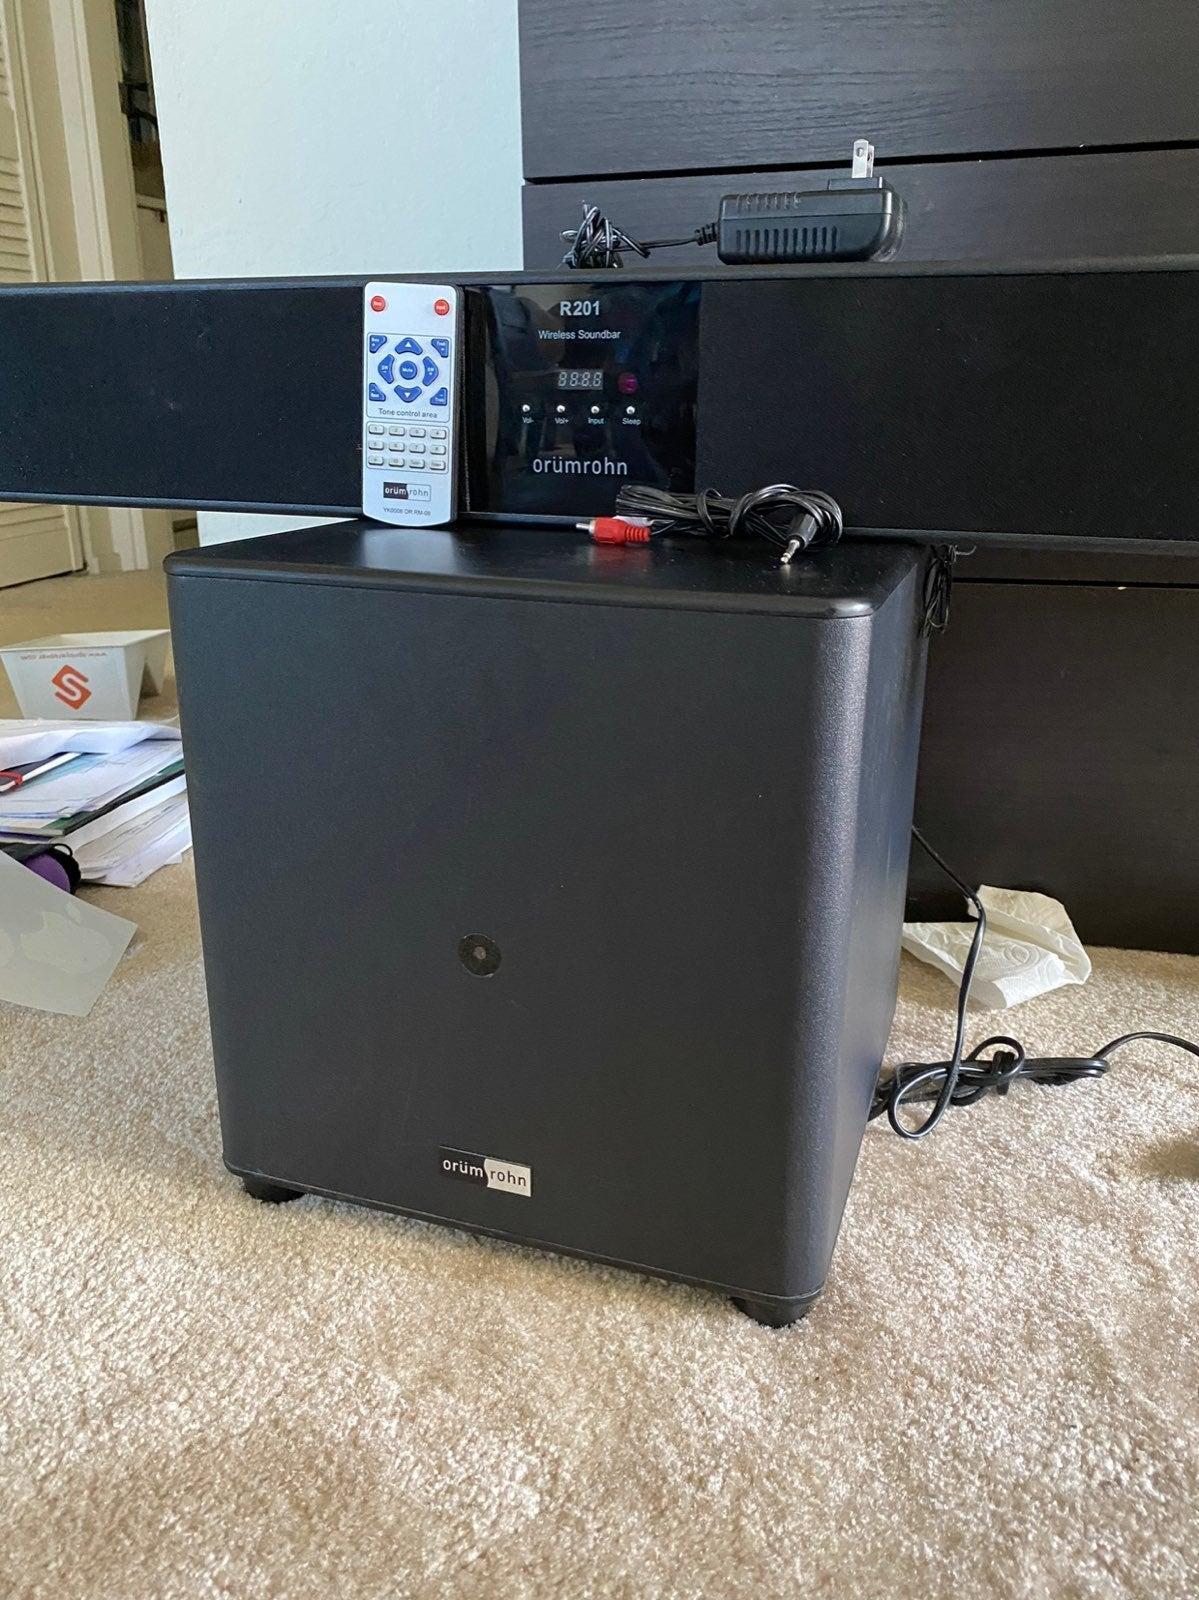 2.1 Channel Sound Bar with Wireless Subw